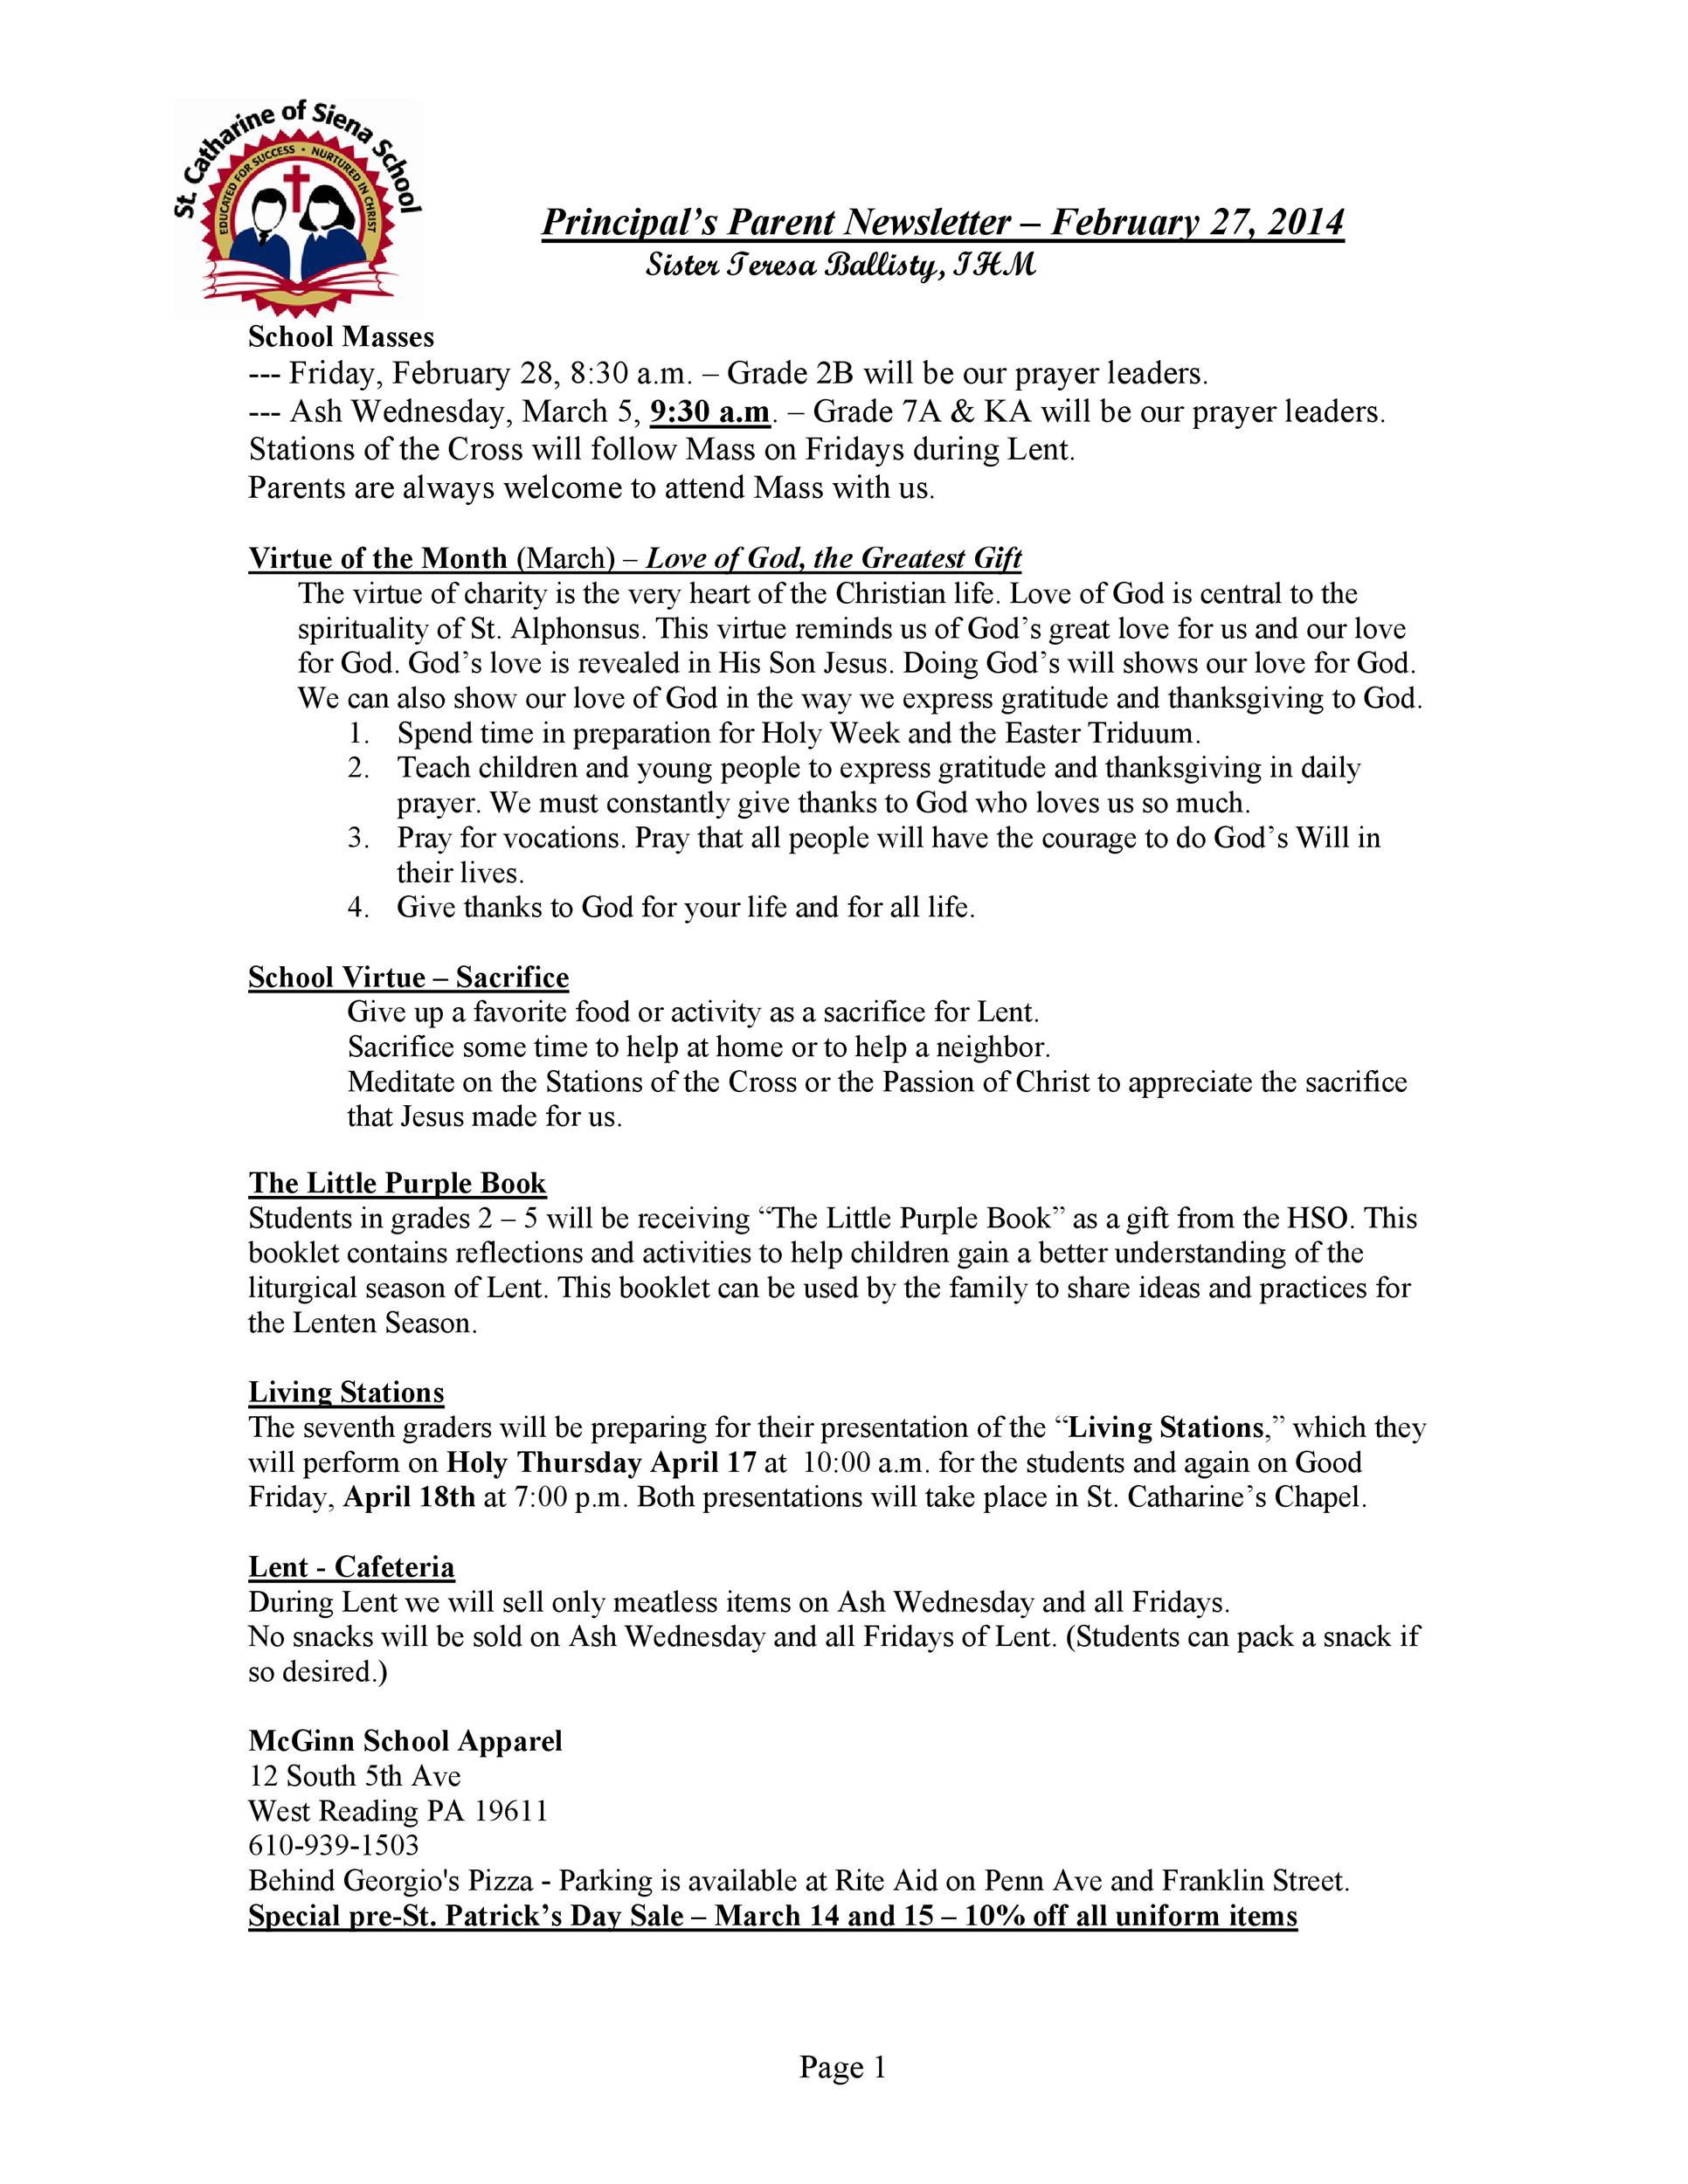 Free preschool newsletter template 21